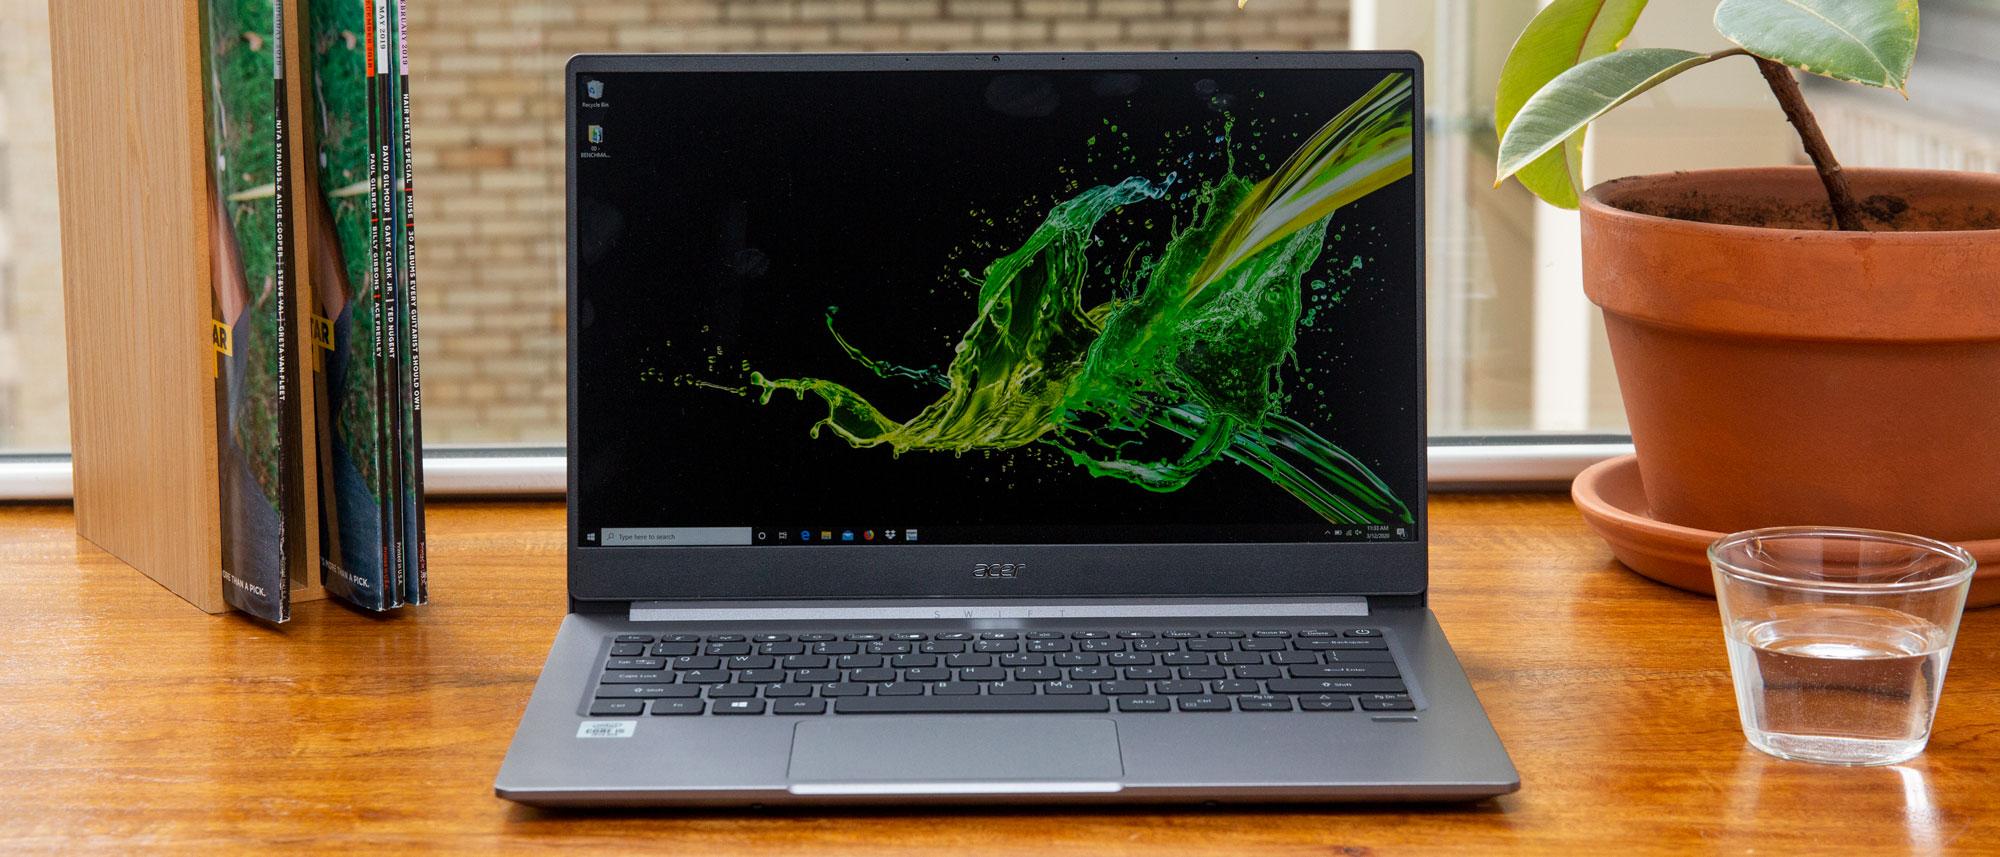 Acer Swift 3 best budget laptop